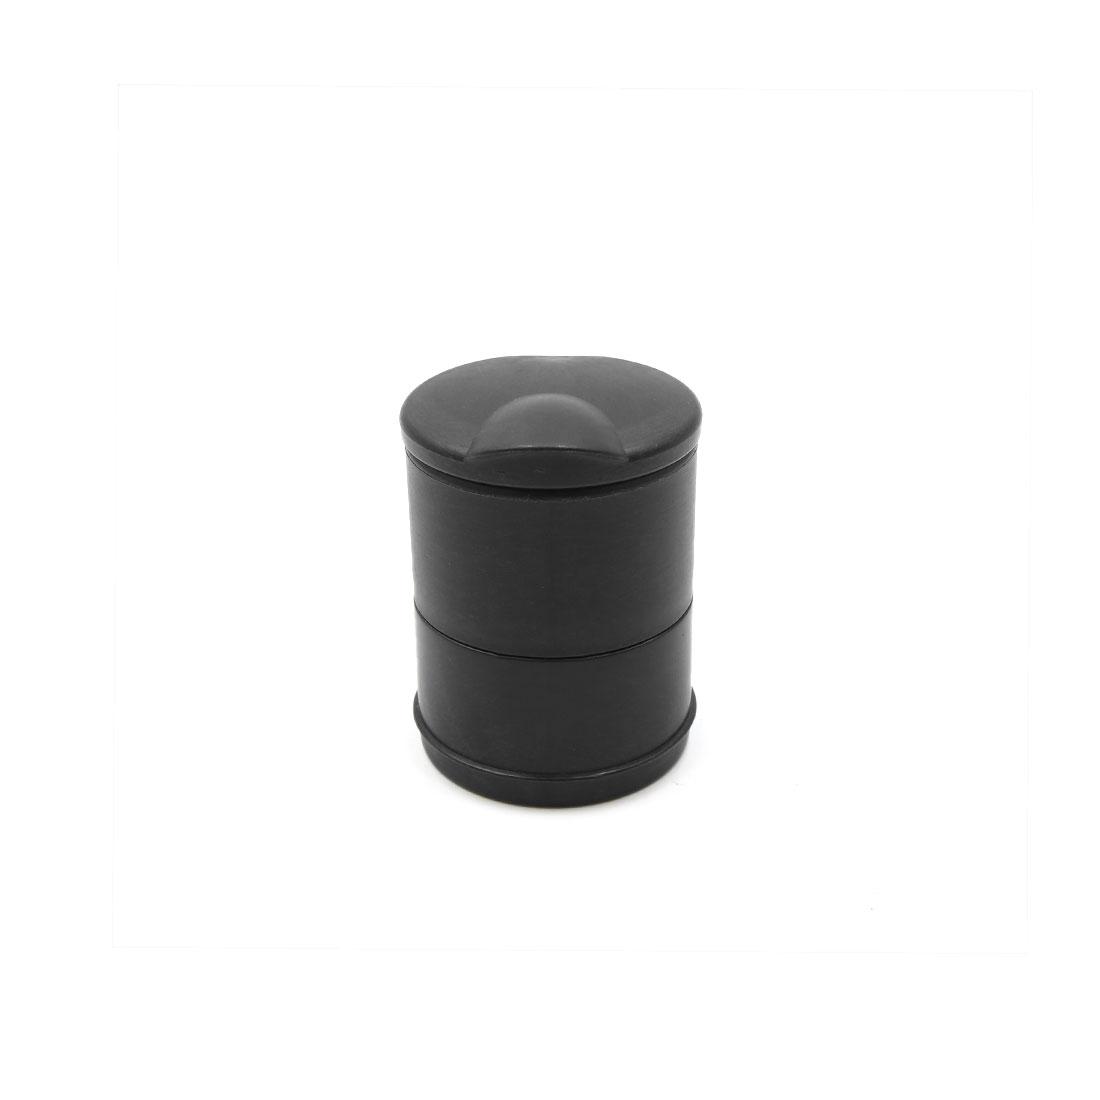 Black Plastic Cylinder Car Blue Light Cigarette Smoke Ashtray Holder Interior